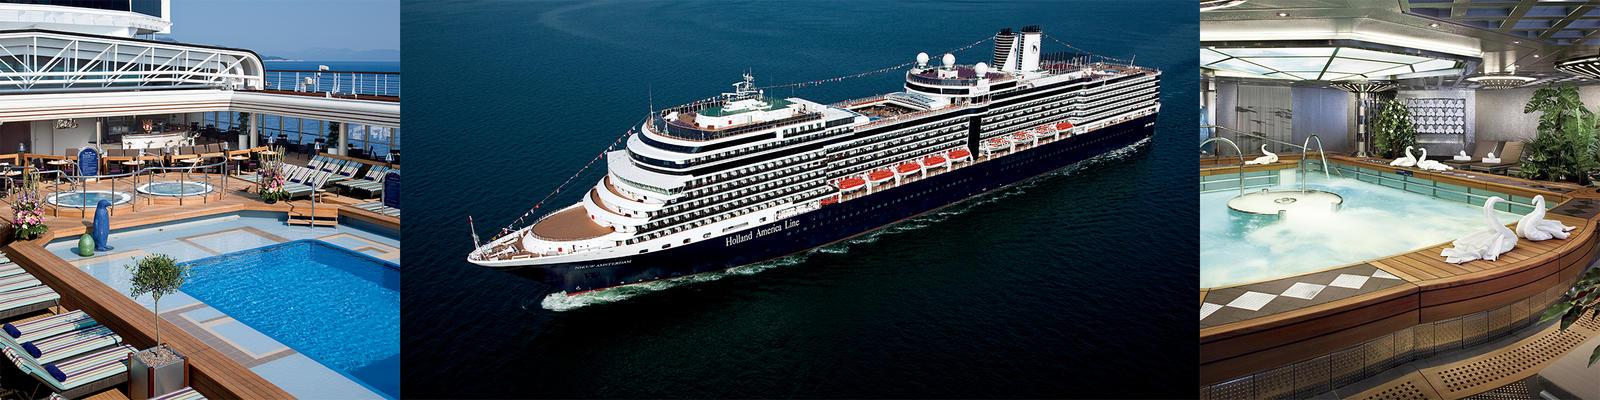 Holland America Amsterdam Cruise Ship | MS Amsterdam Cruises